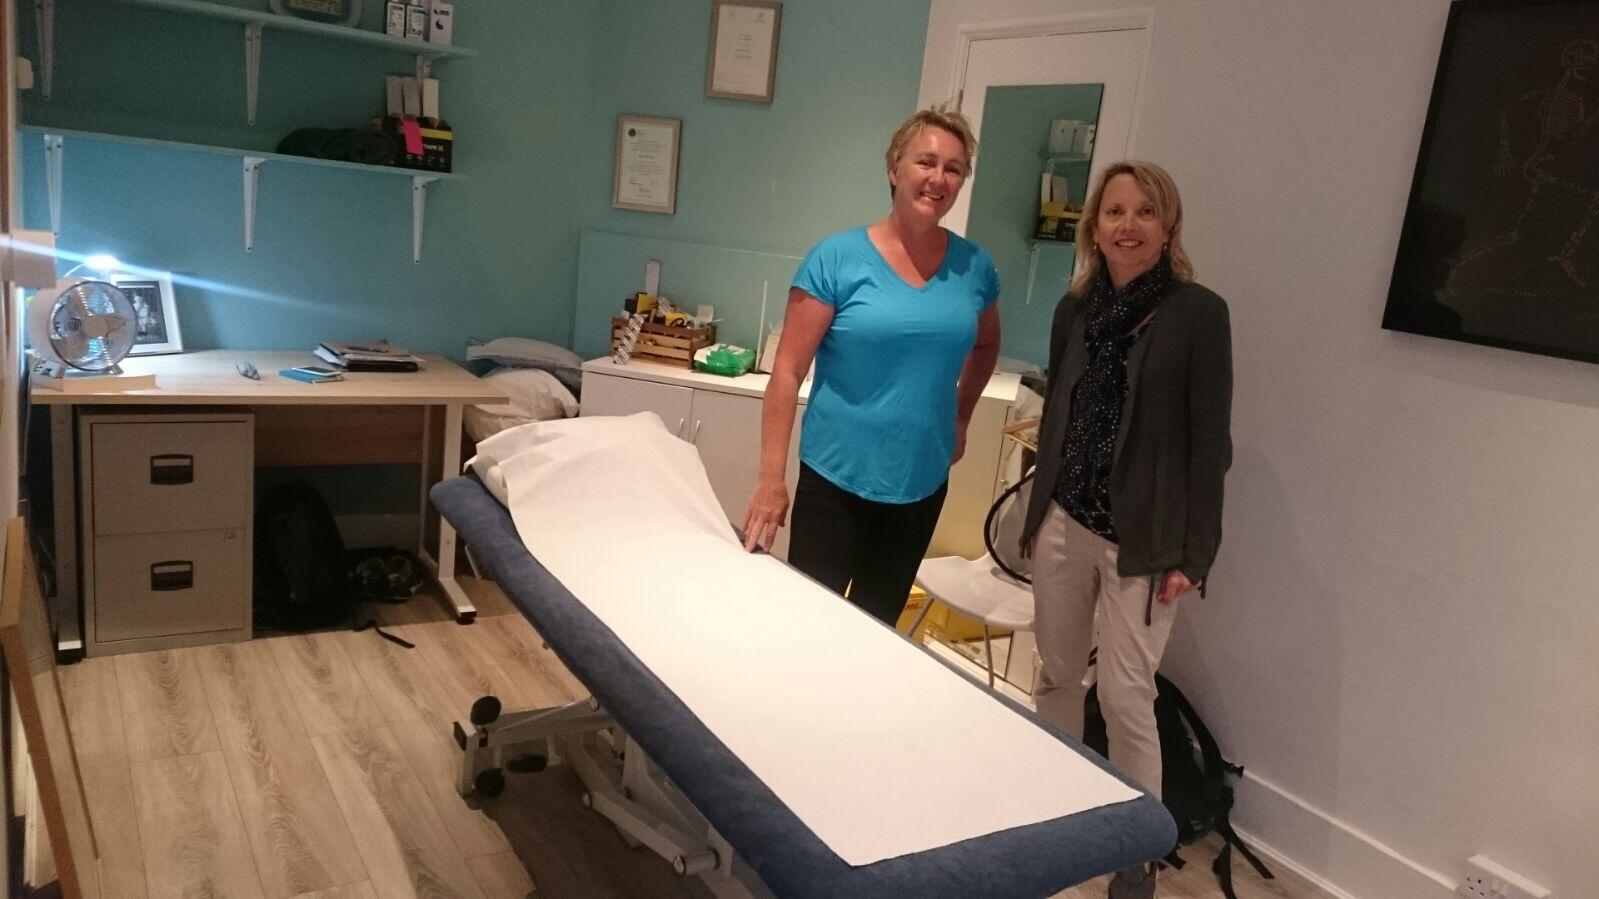 Lisa Opie of Osteopath West in Ealing